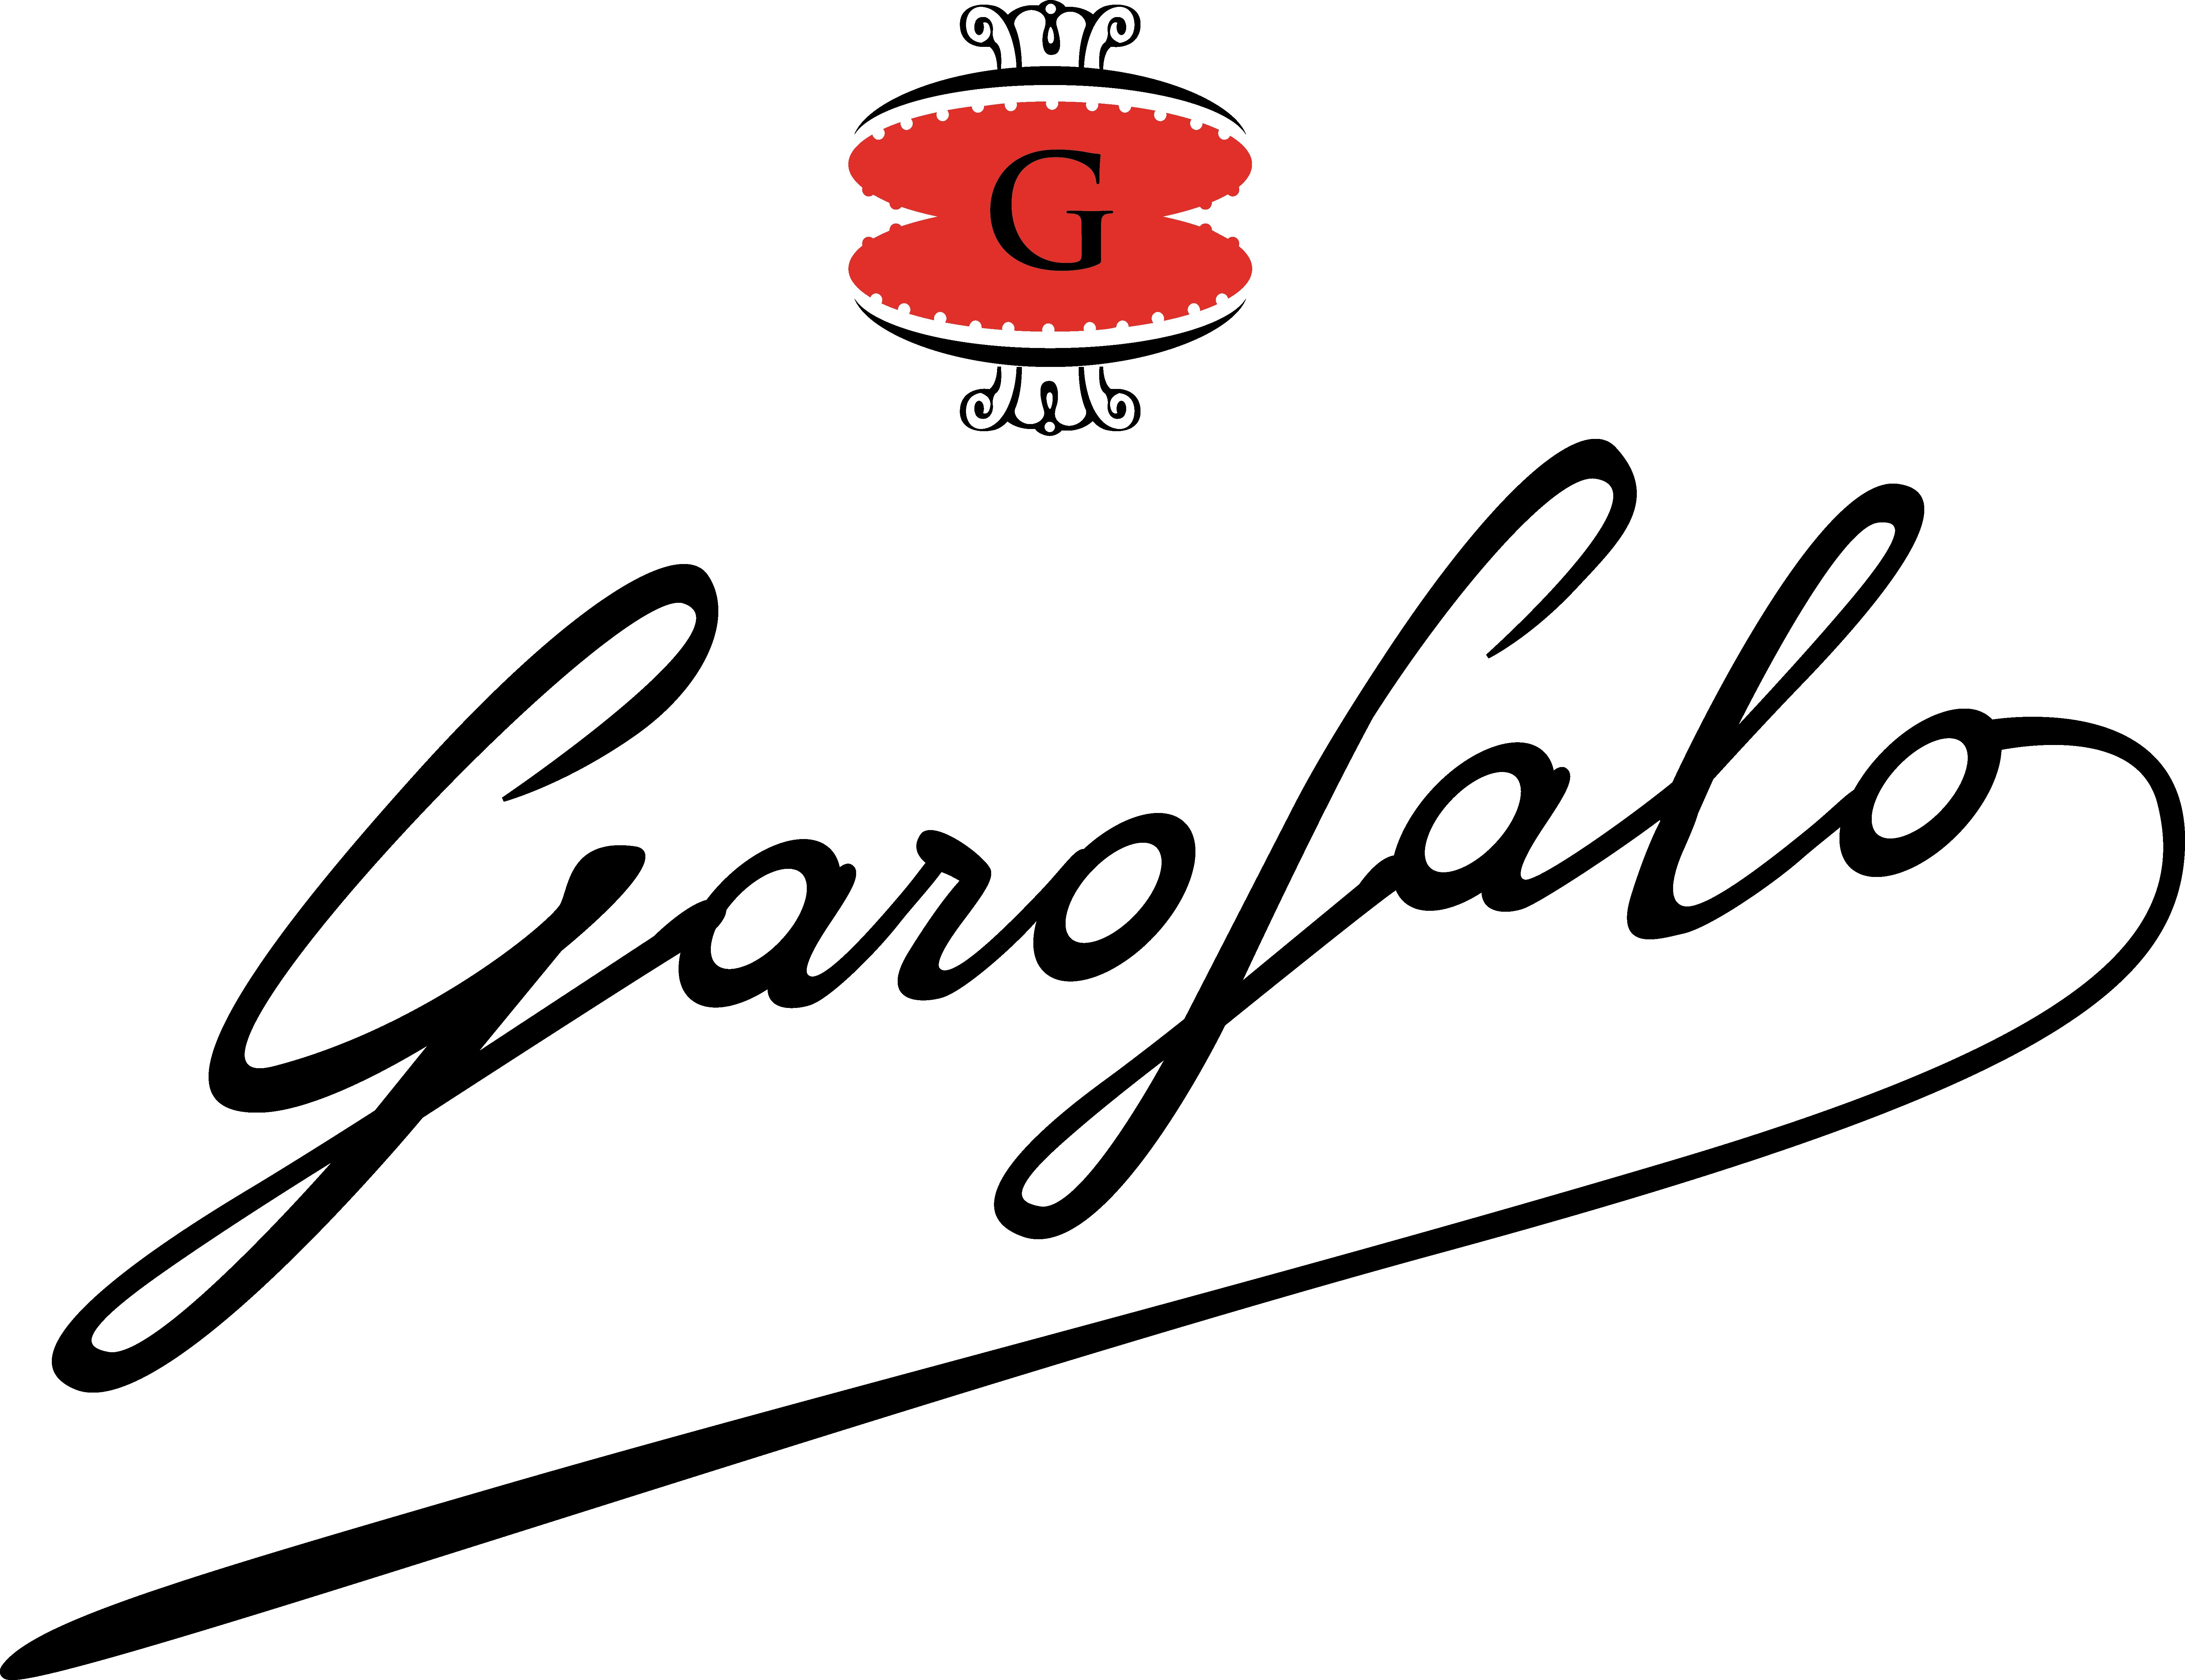 Logotipo garofalo